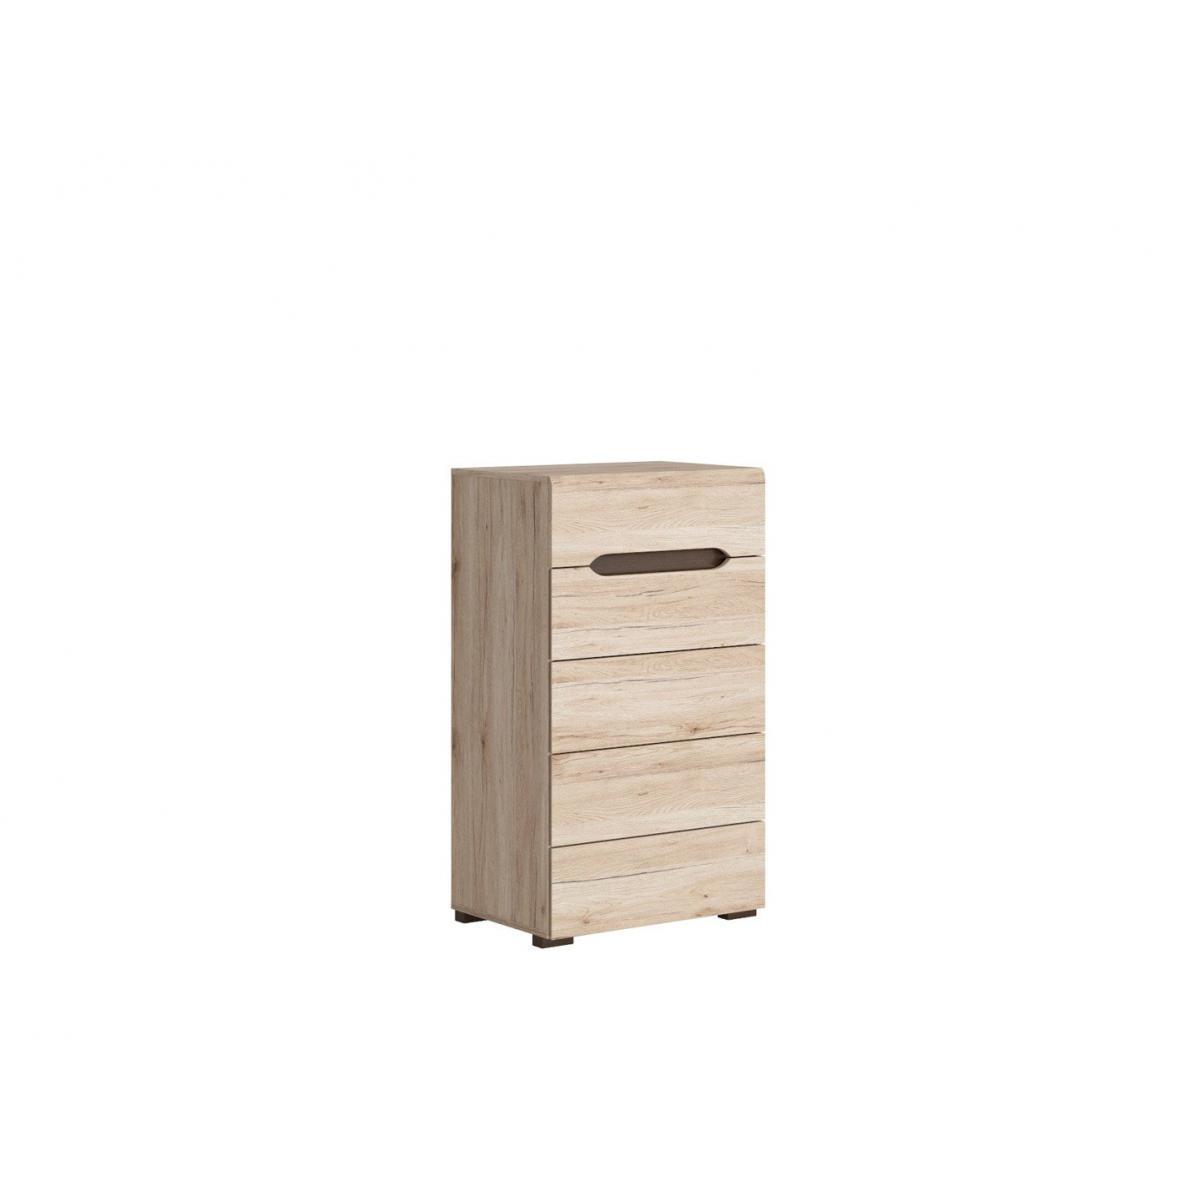 Hucoco SUZANNI | Commode pour salon chambre adulte | Style scandinave | 104,5 x 60 x 41,5 cm | Tiroirs | Taille compacte - Chên